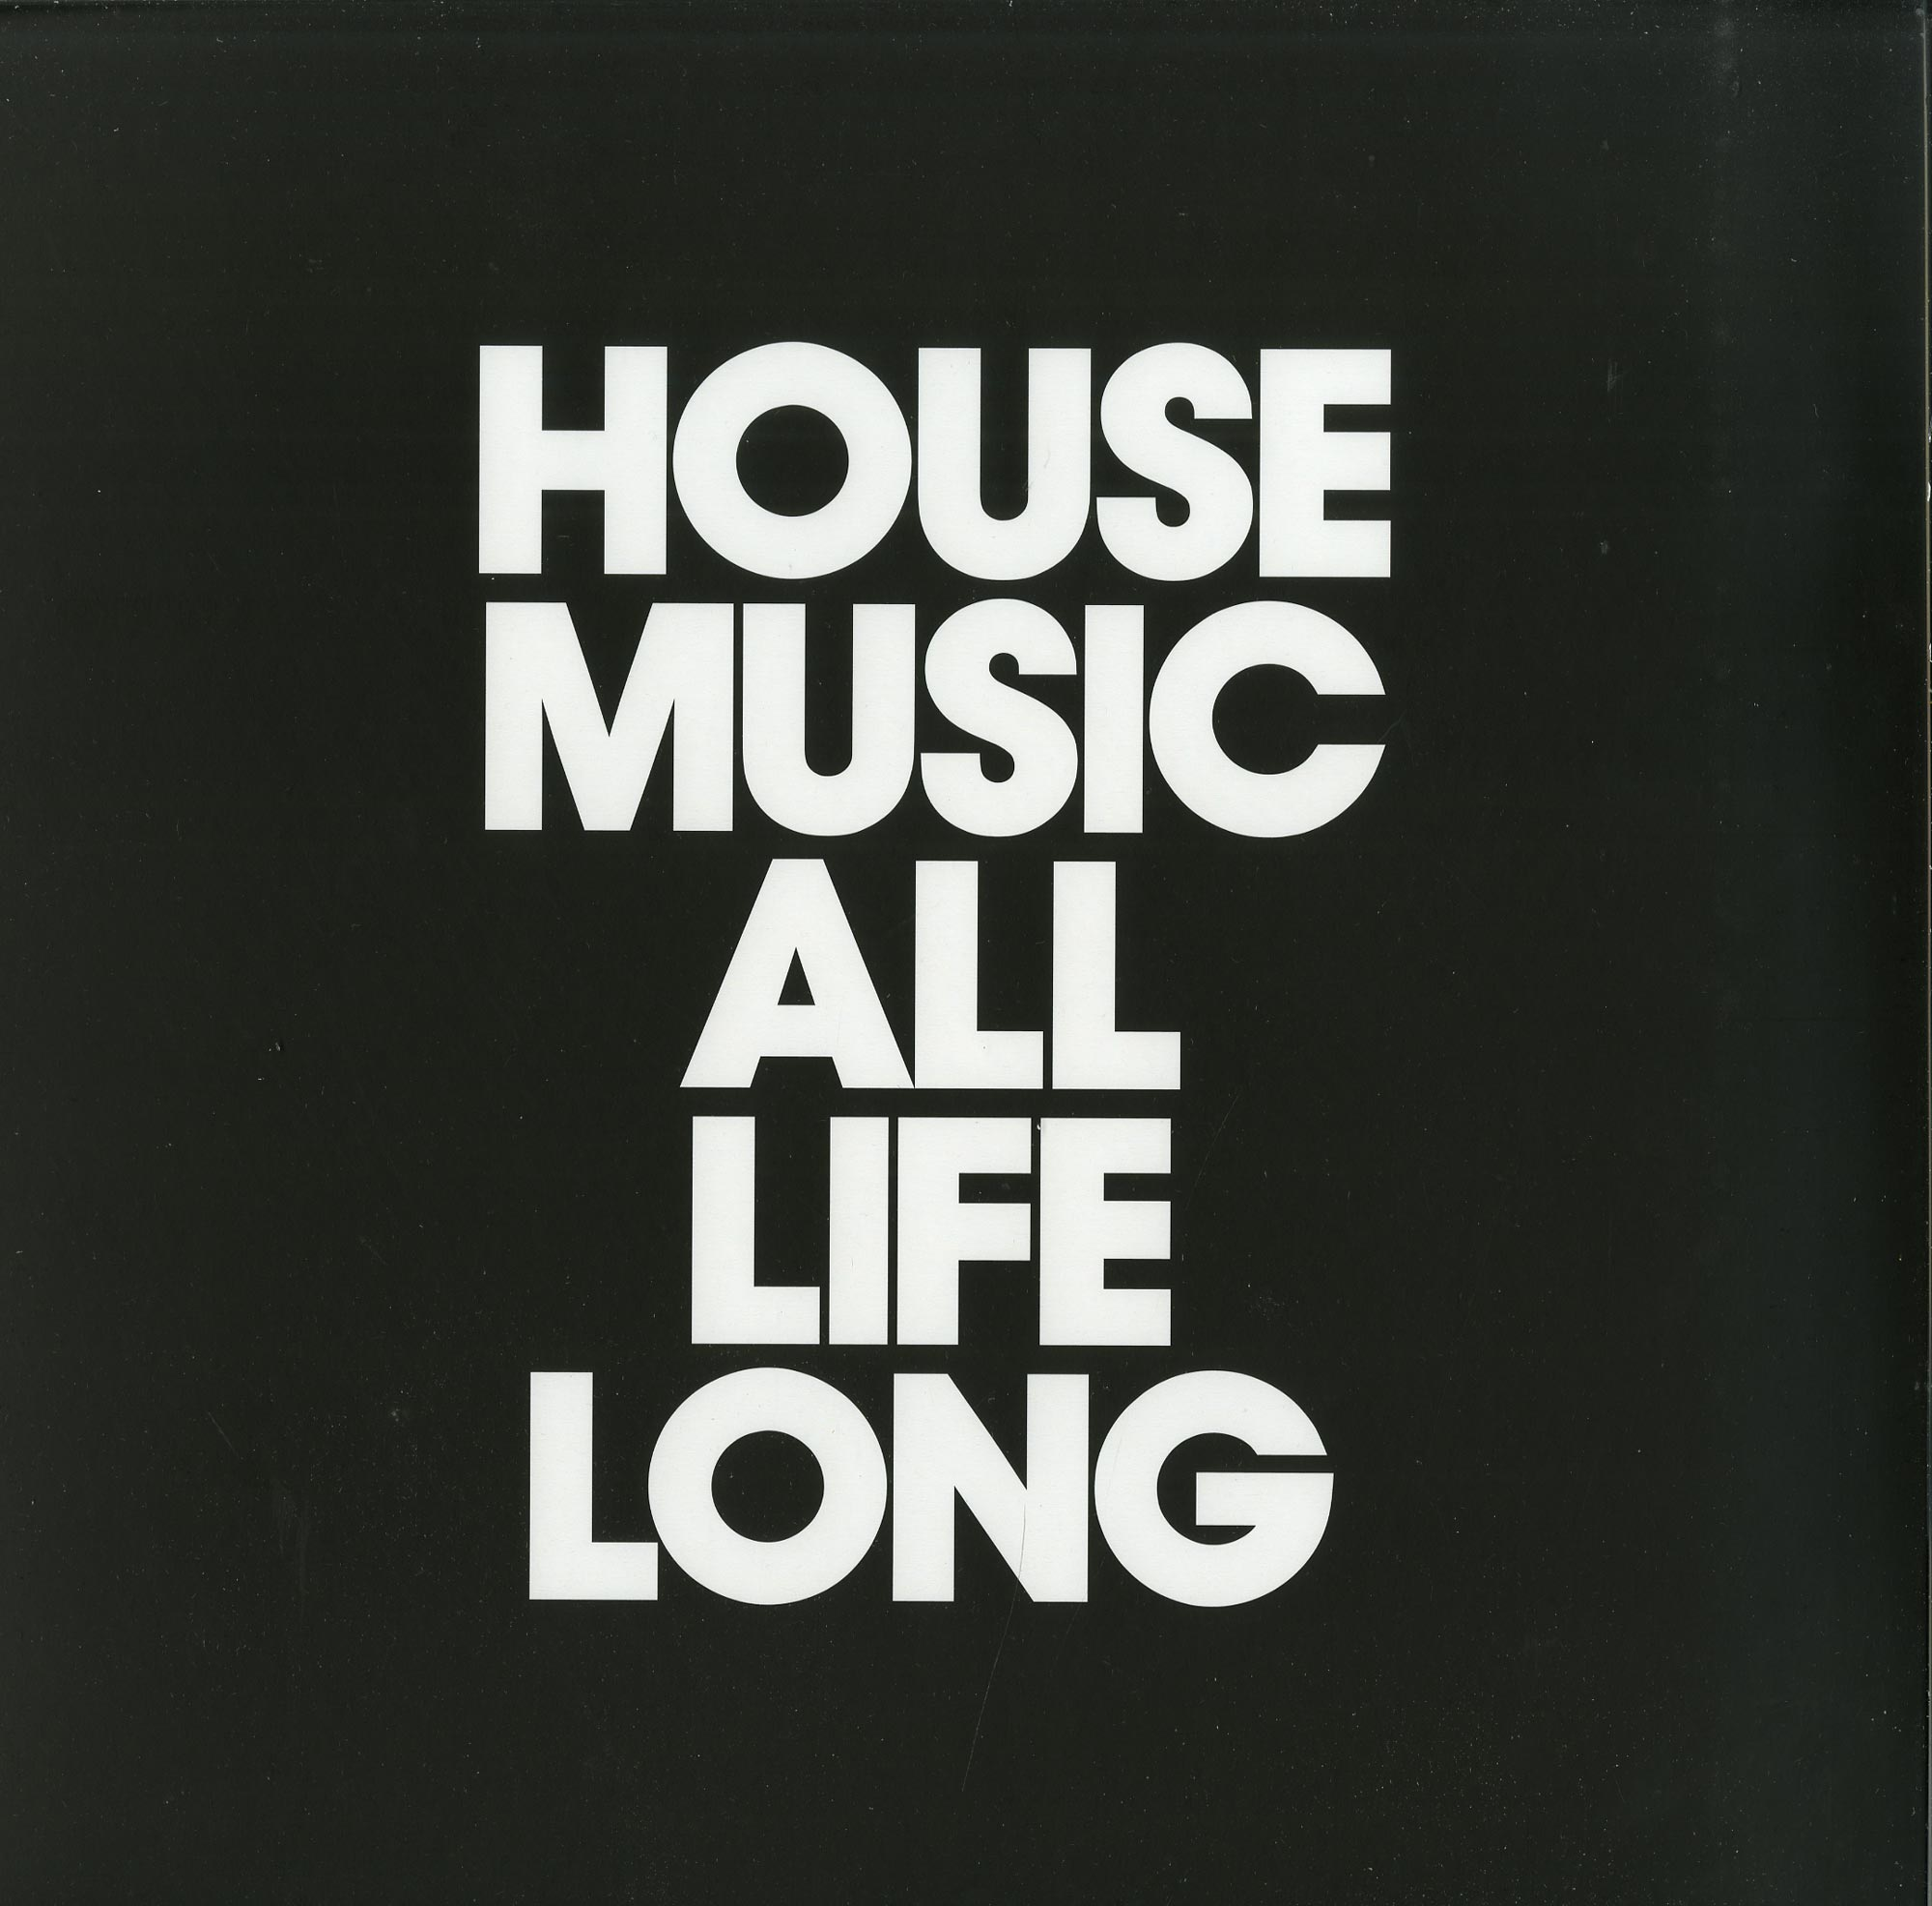 Camelphat & Ali Love, Offaiah, Josh Butler feat. Hanlei, David Penn) - HOUSE MUSIC ALL LIFE LONG EP1